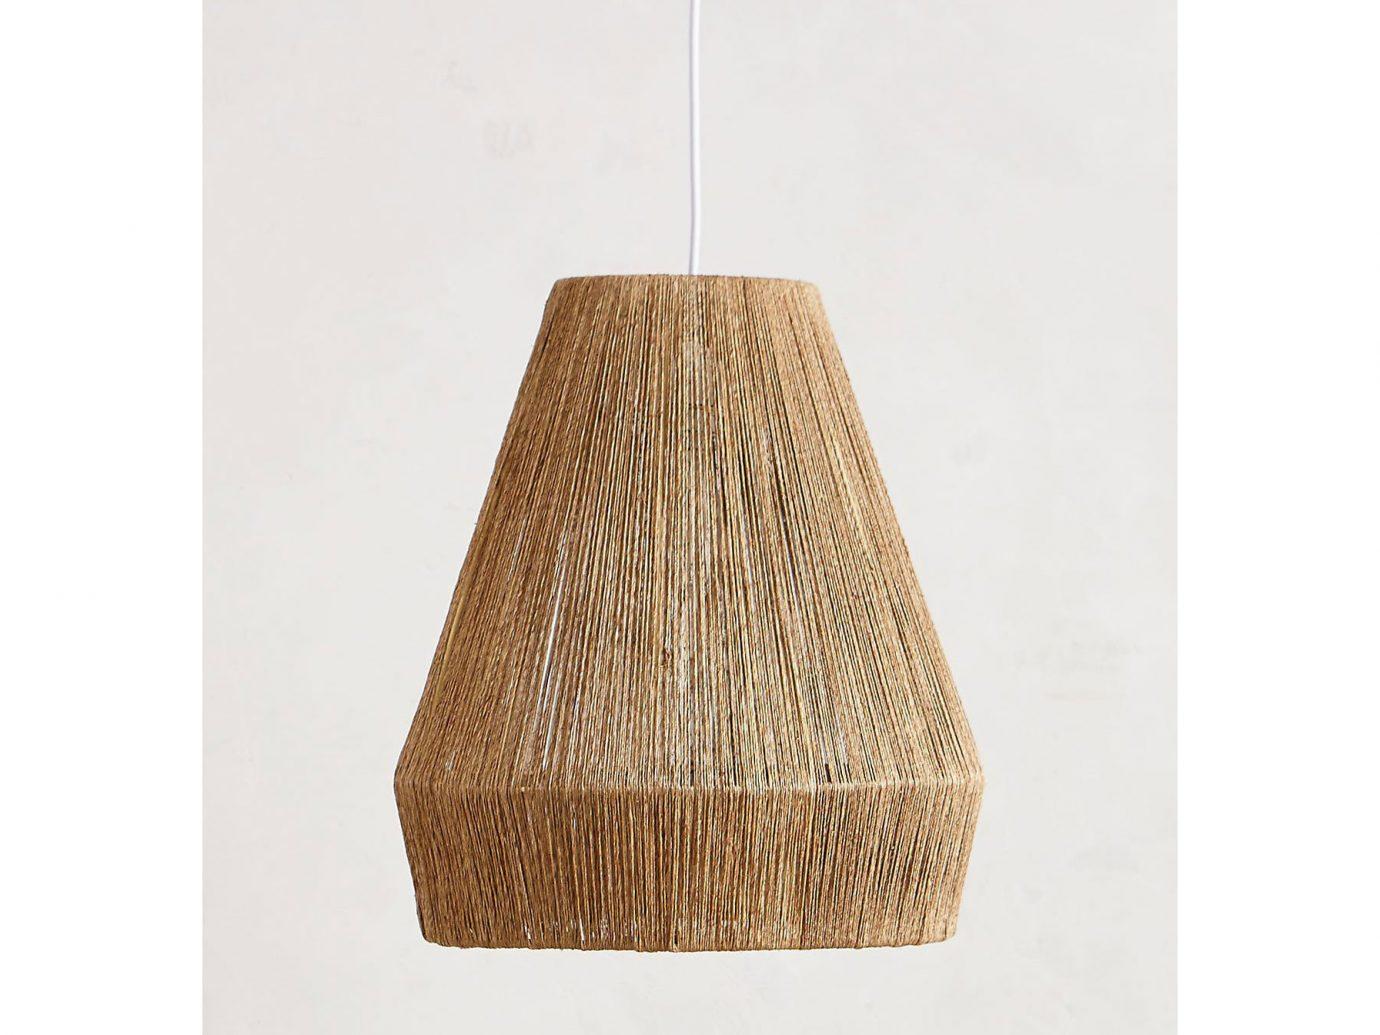 City Copenhagen Kyoto Marrakech Palm Springs Style + Design Travel Shop Tulum product design lighting accessory lampshade